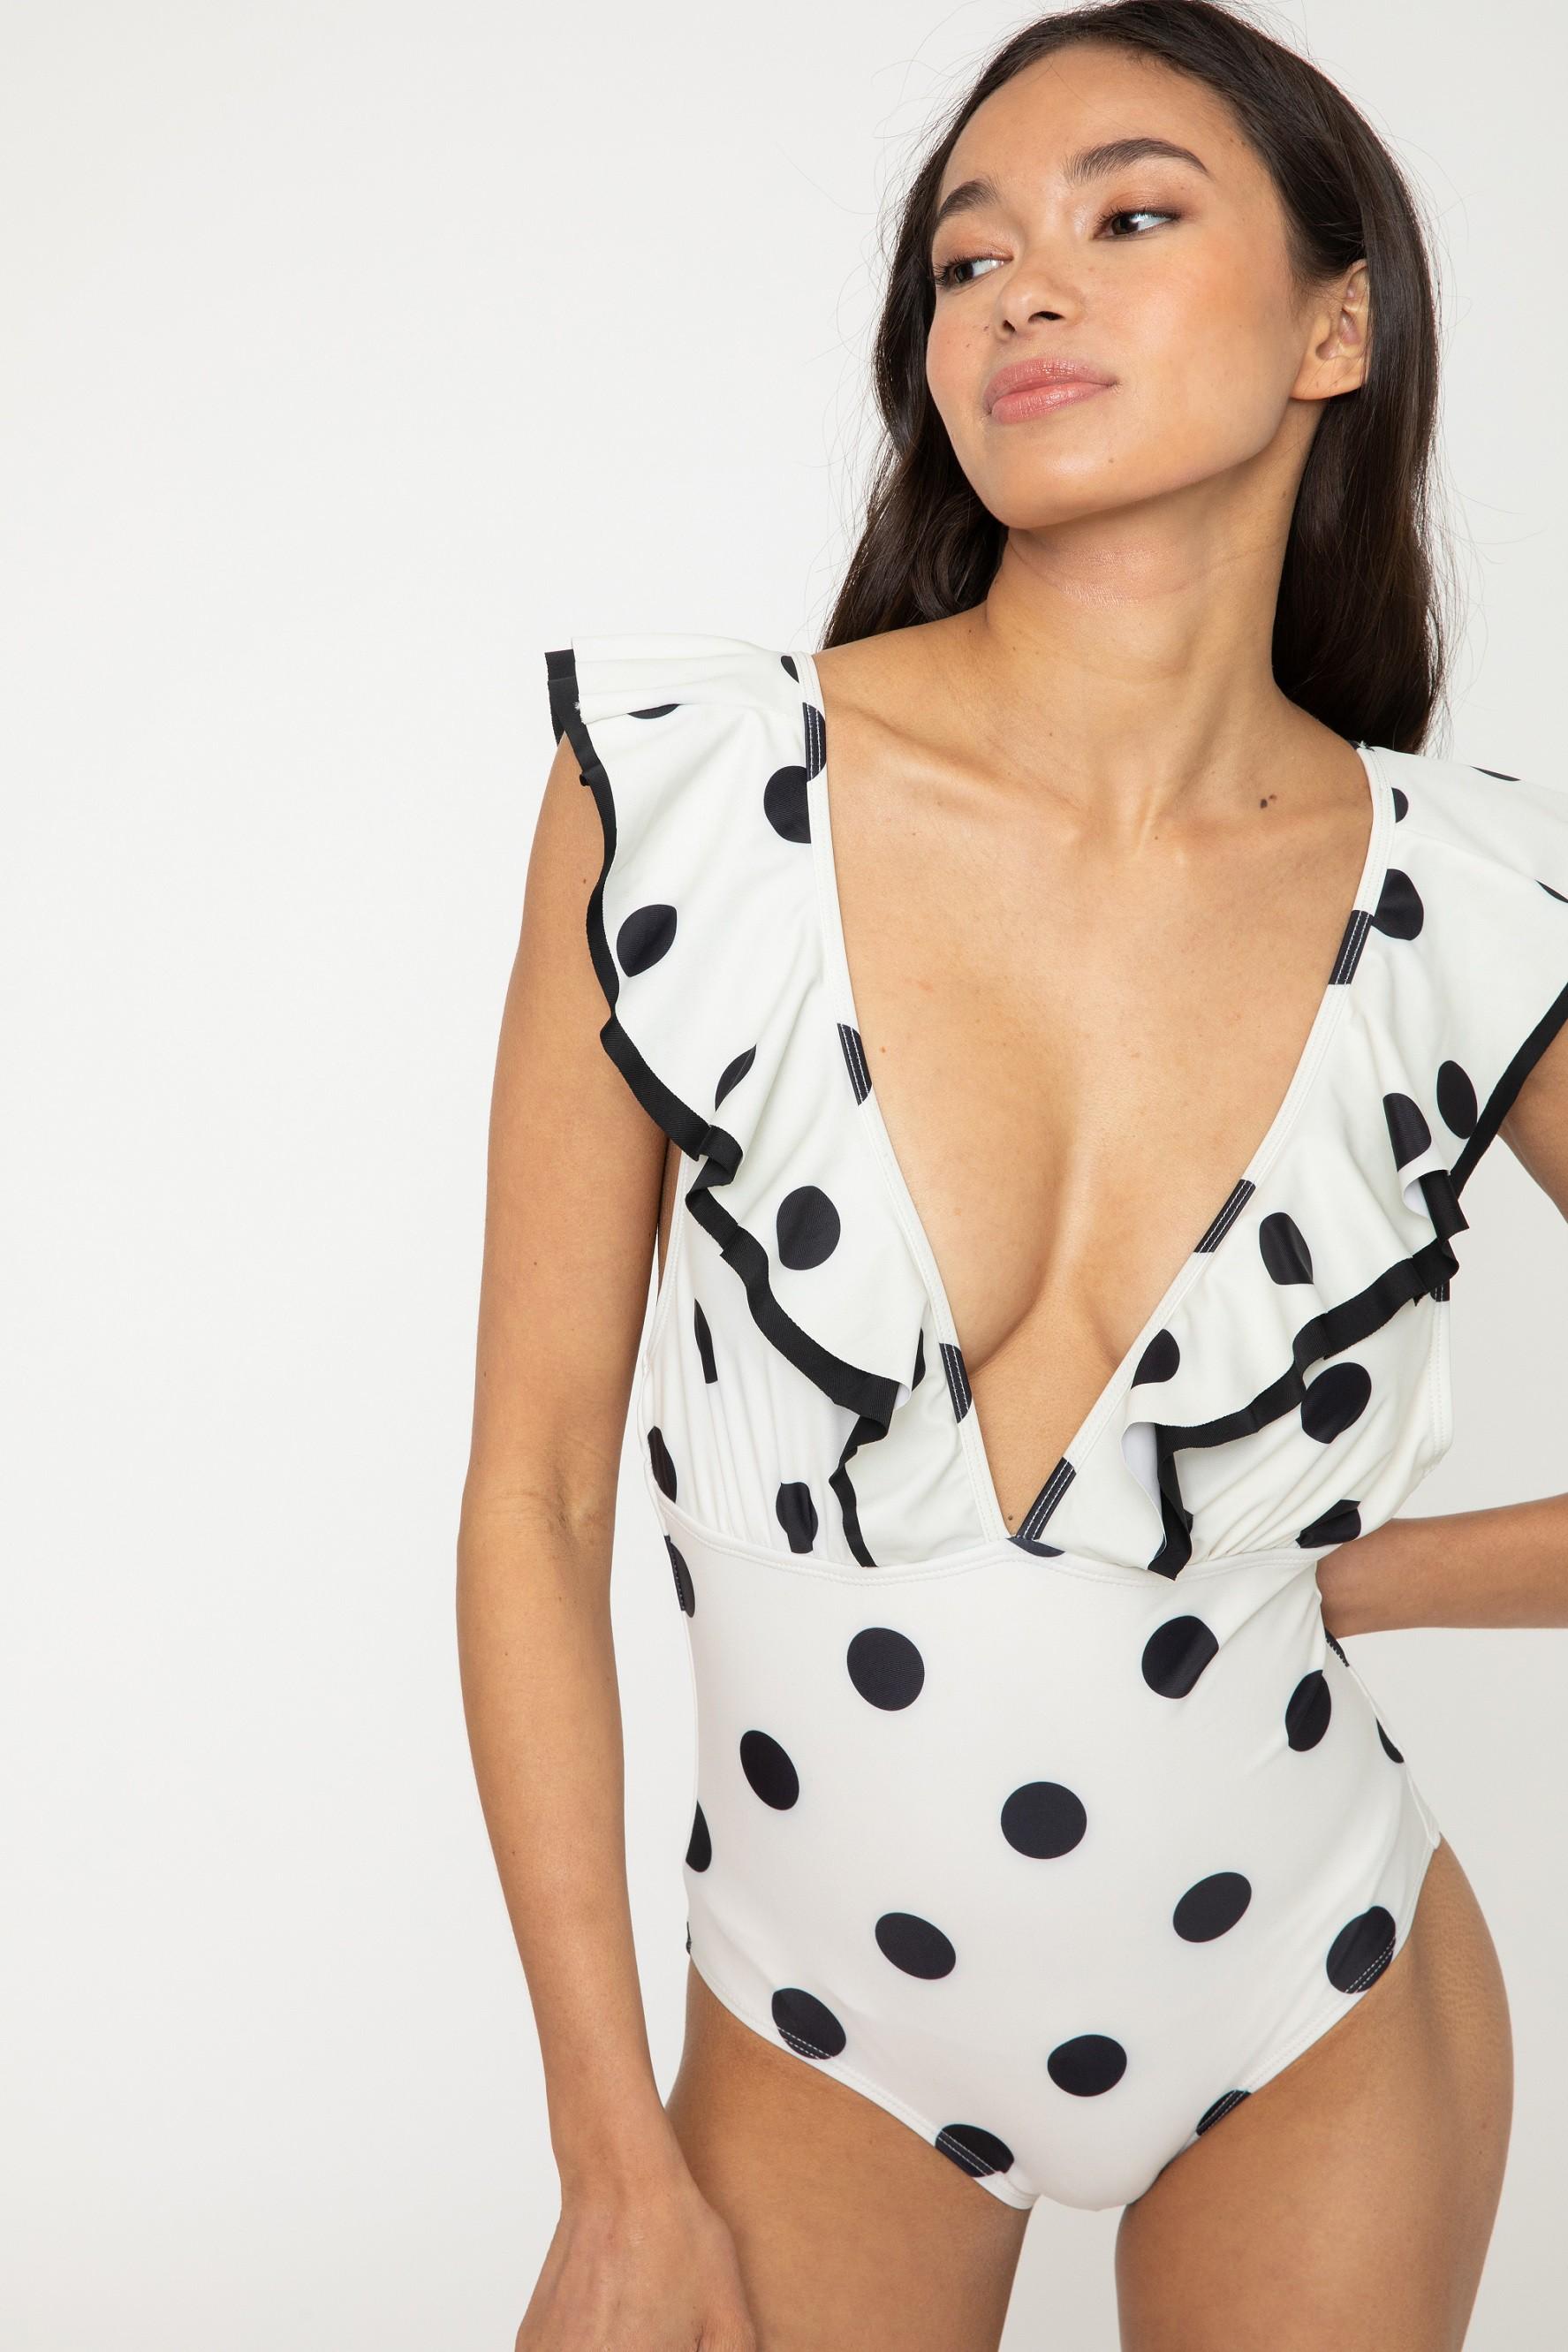 V Neck Double Ruffle Trim Swimsuit -White/ Black - Front